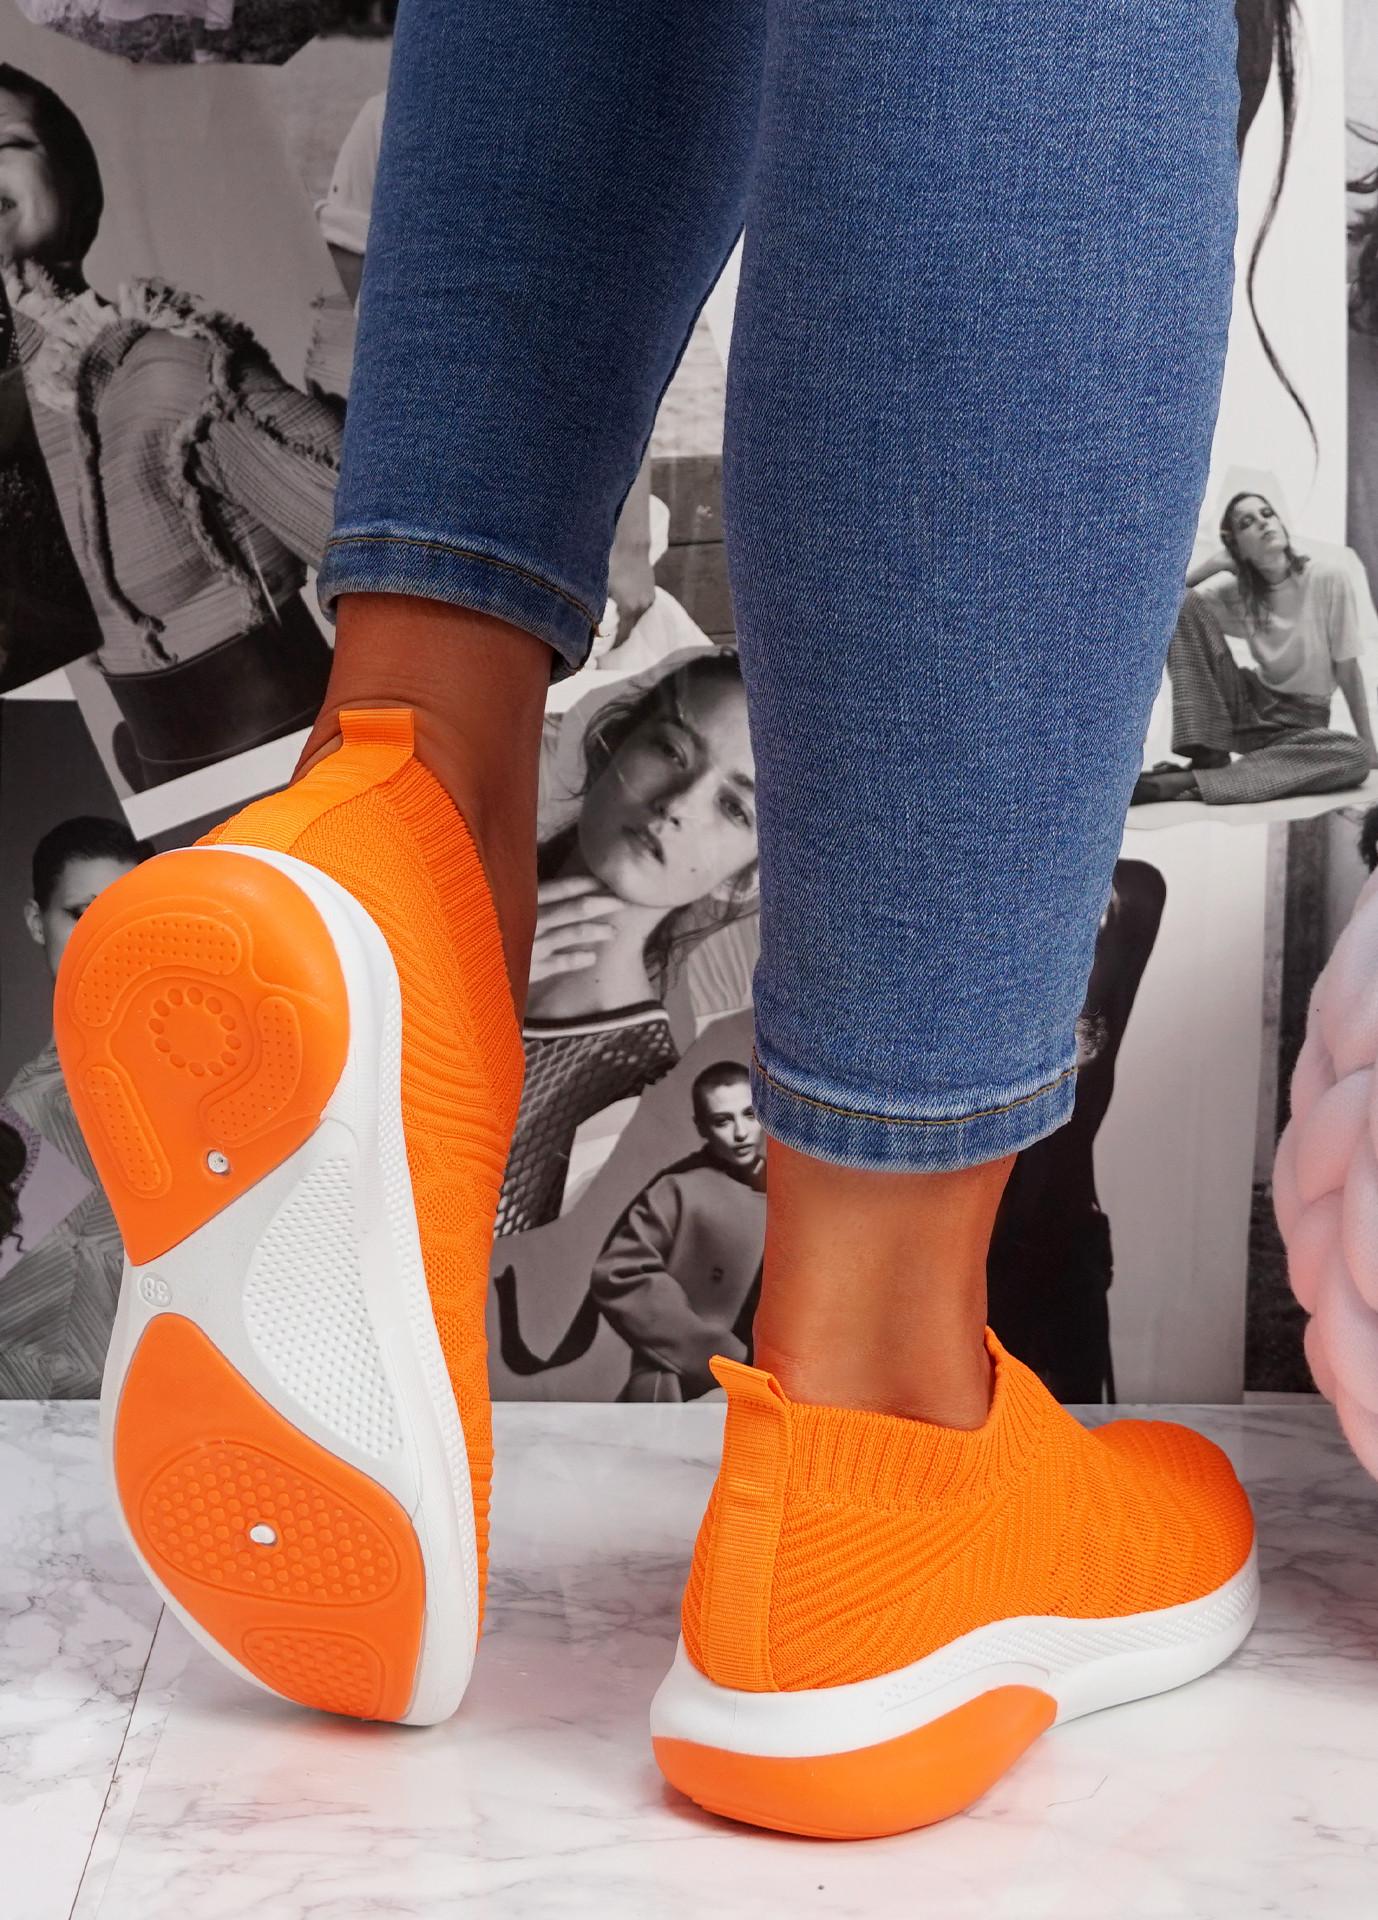 Muzy Orange Knit Slip On Trainers